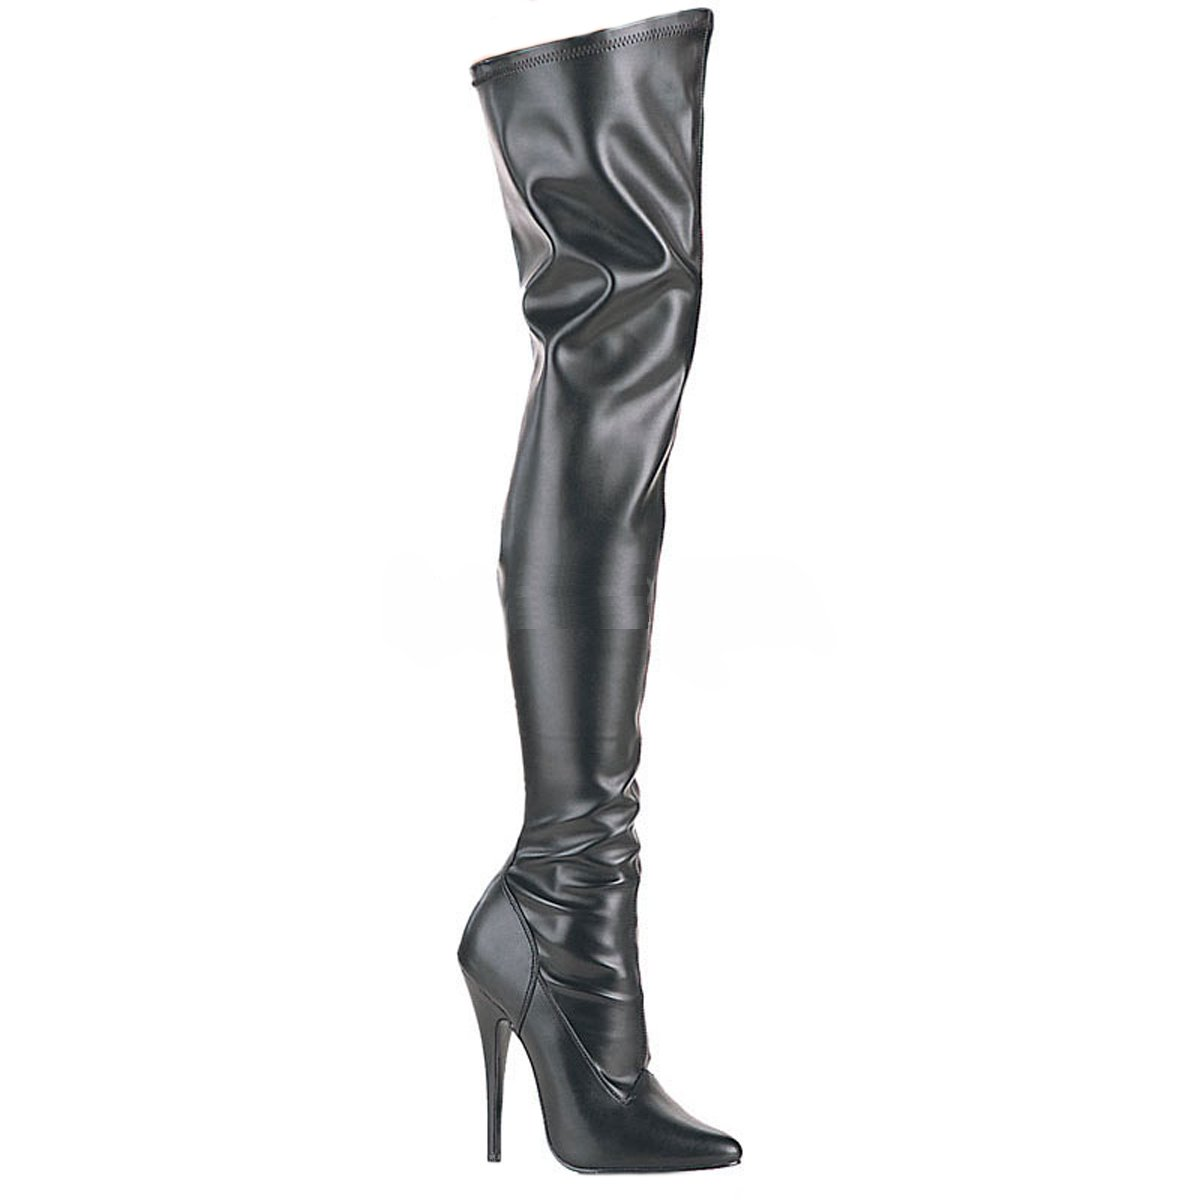 PleaserUSA High-Heel-Overknee-Stiefel Domina-3000  38.5 EU|Mattschwarz